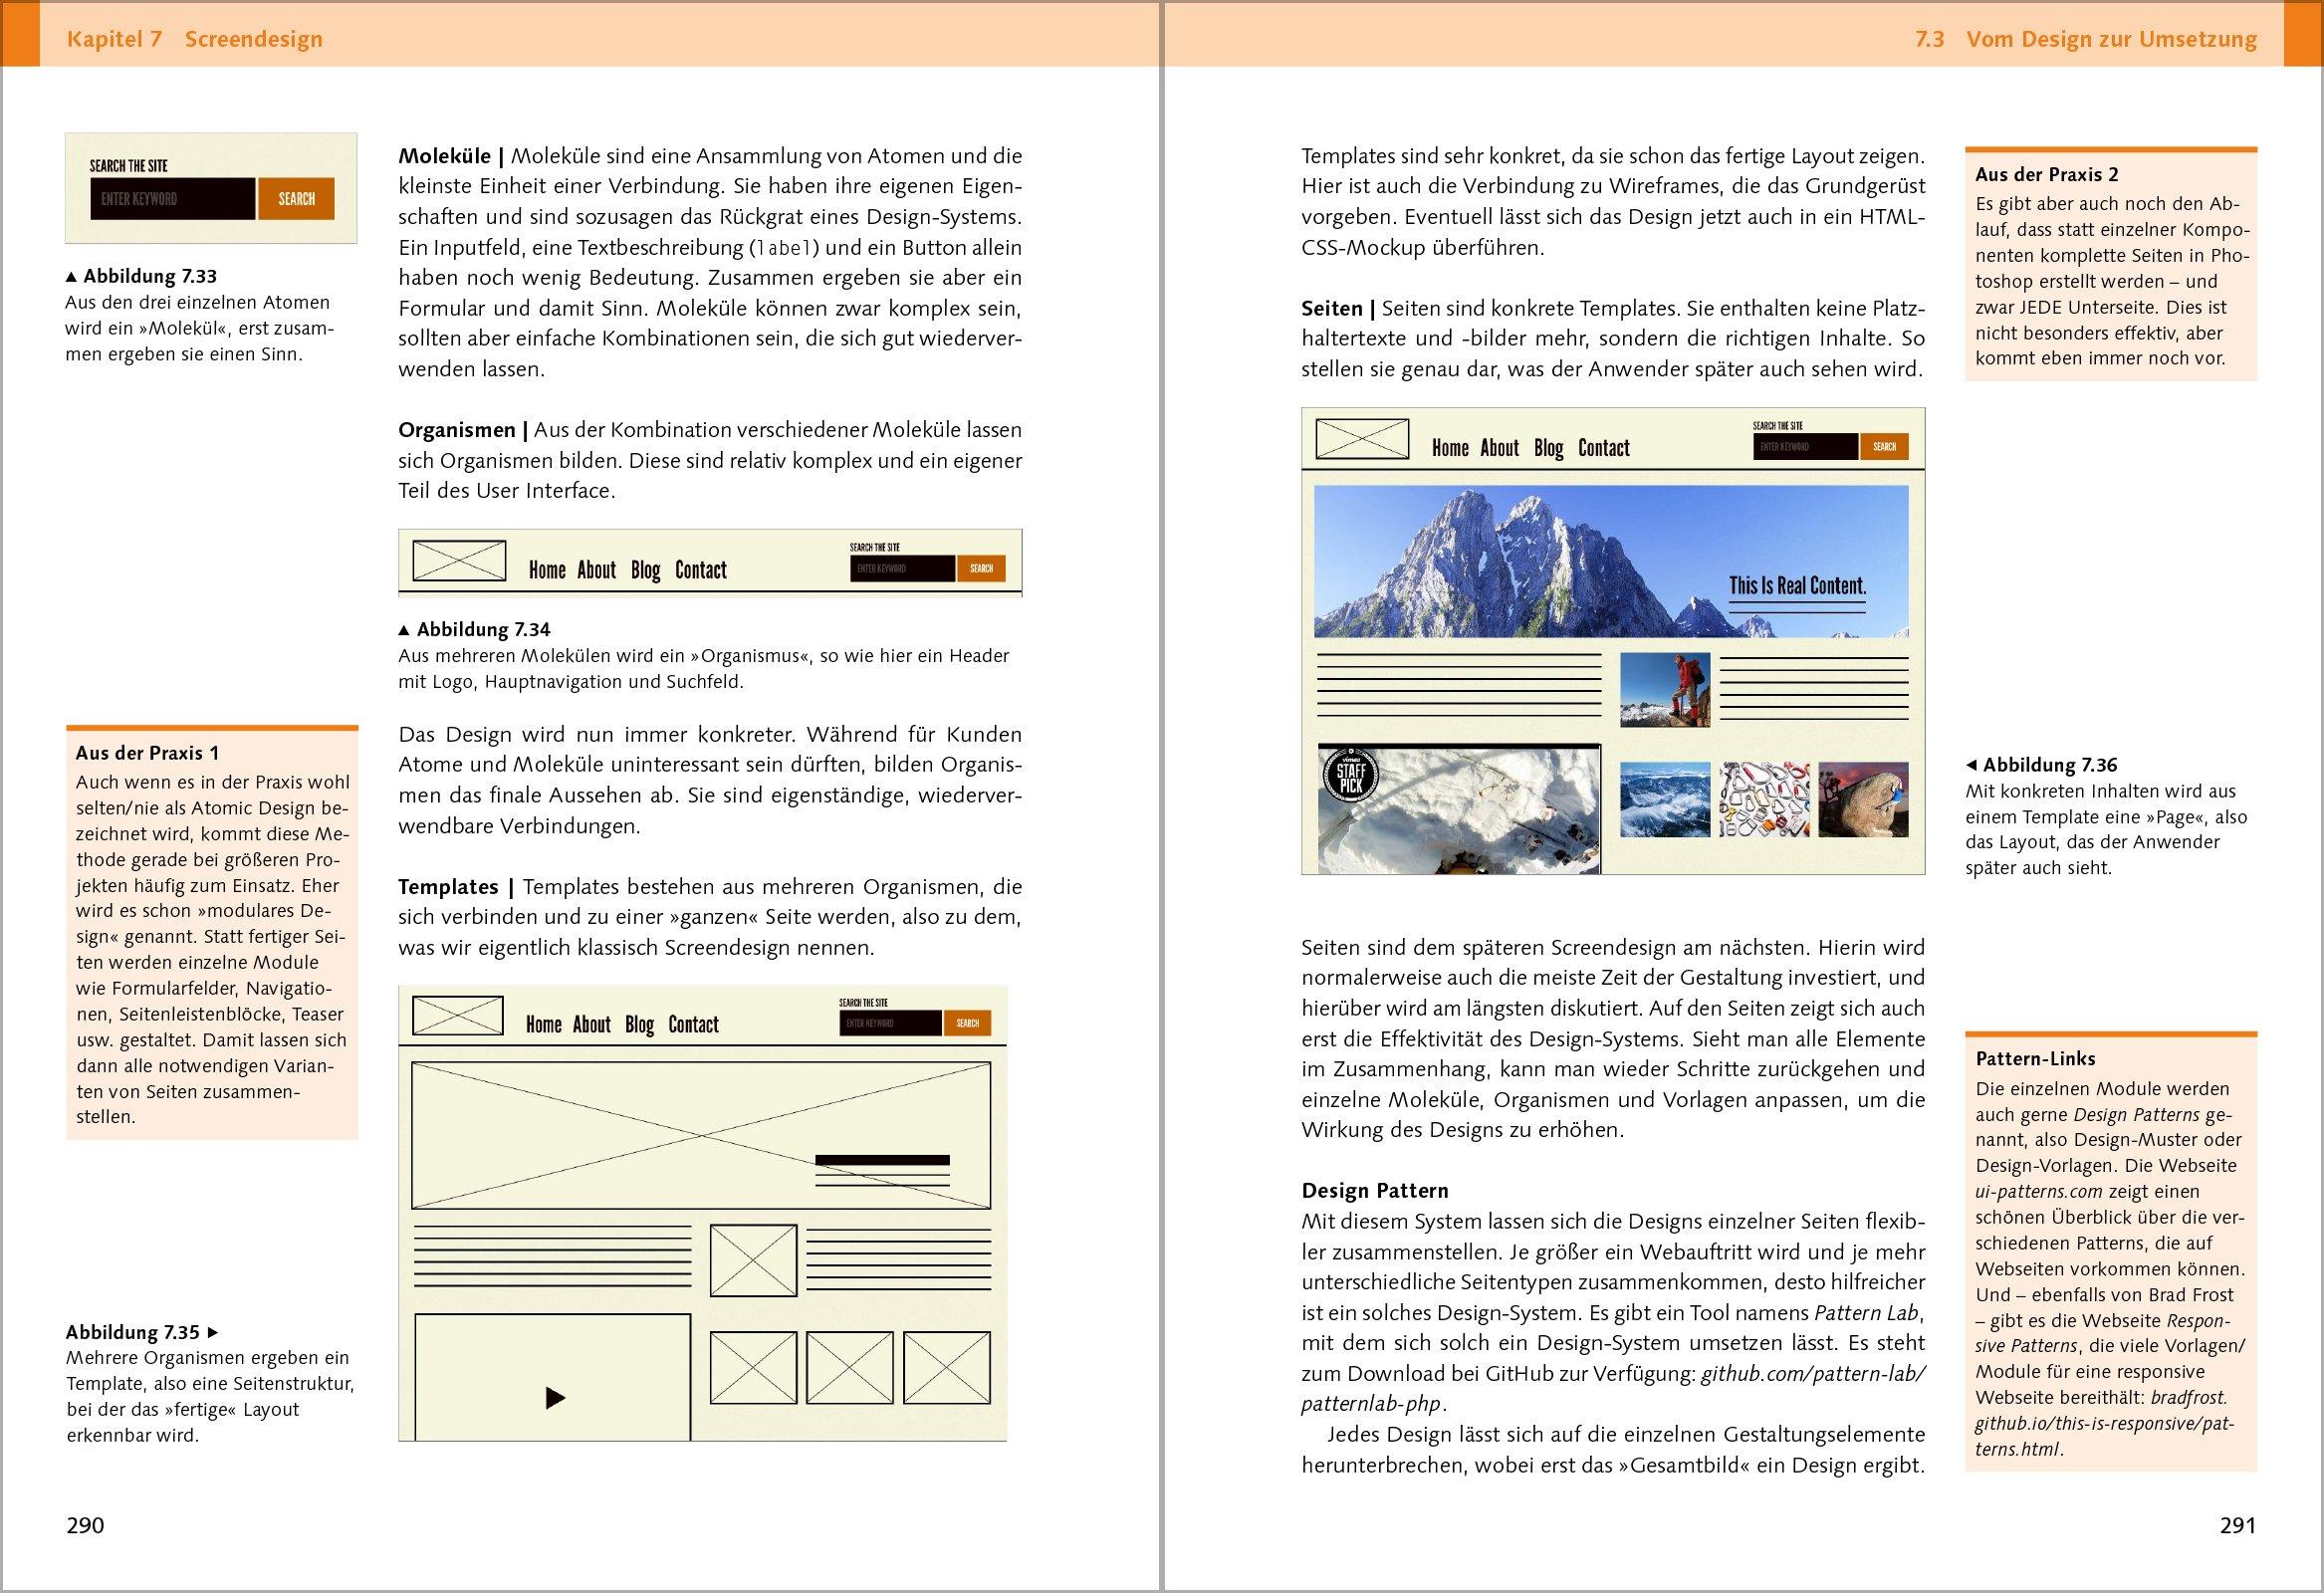 Webdesign: Das Handbuch zur Webgestaltung: Amazon.de: Martin Hahn ...